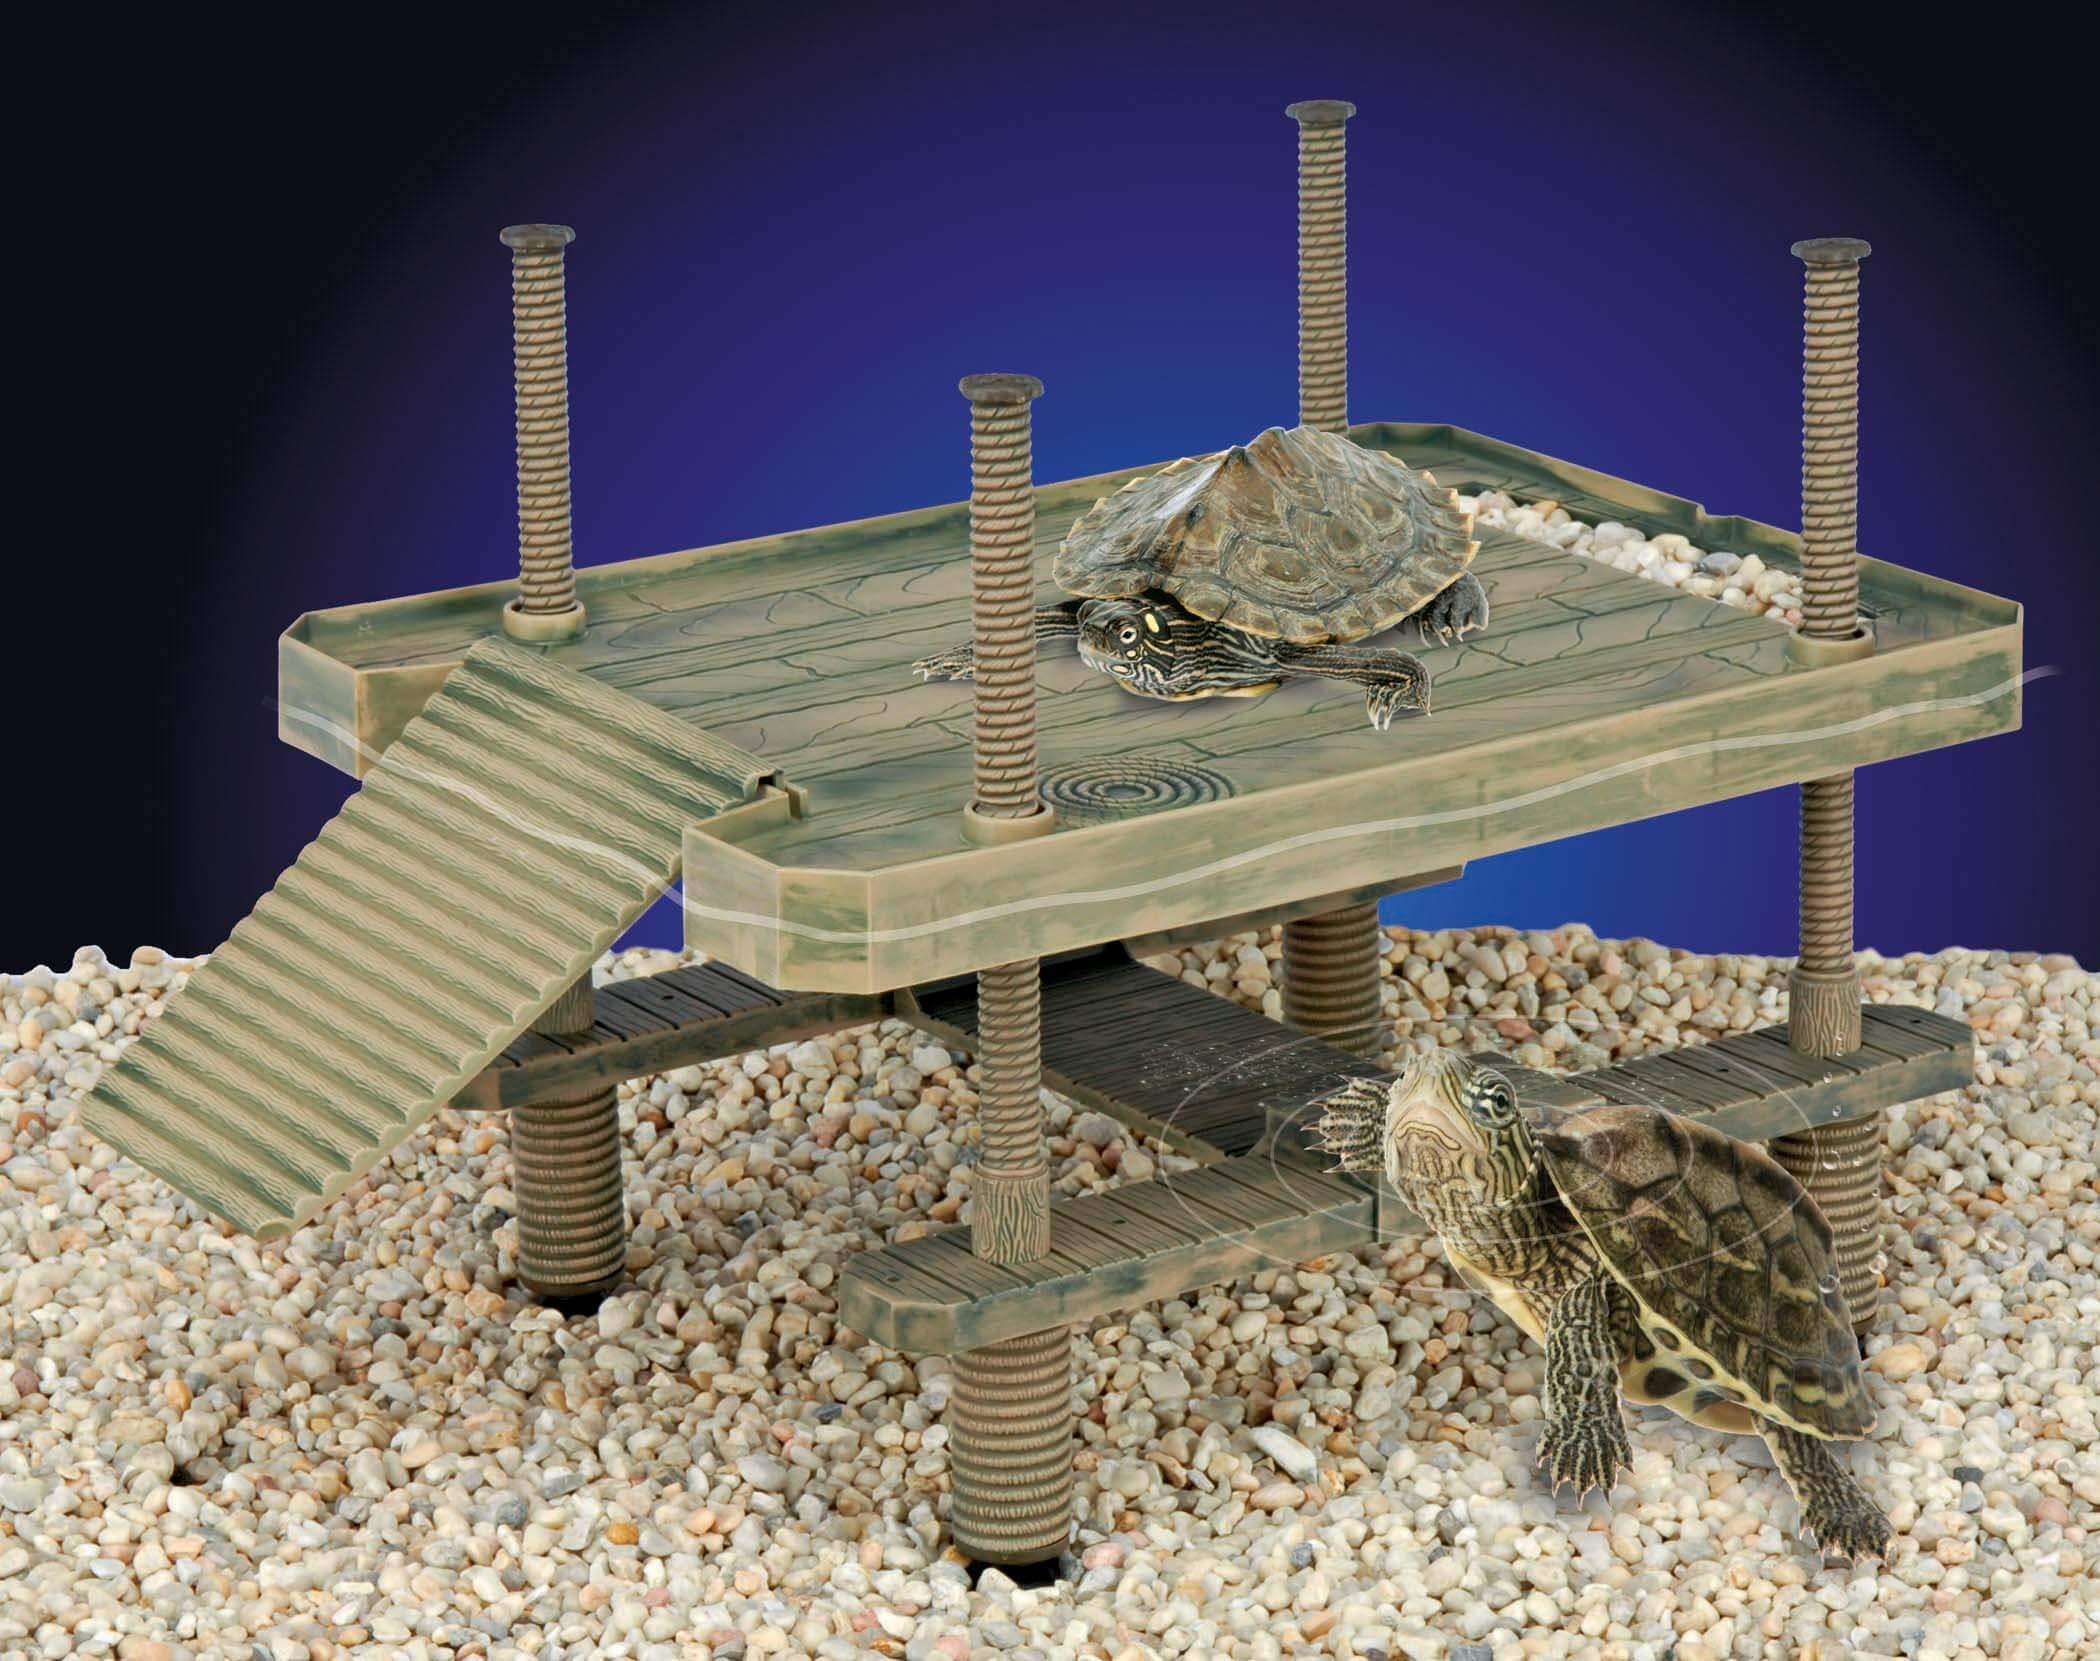 Penn-Plax Reptology Life Science Floating Turtle-Pier Basking Platform